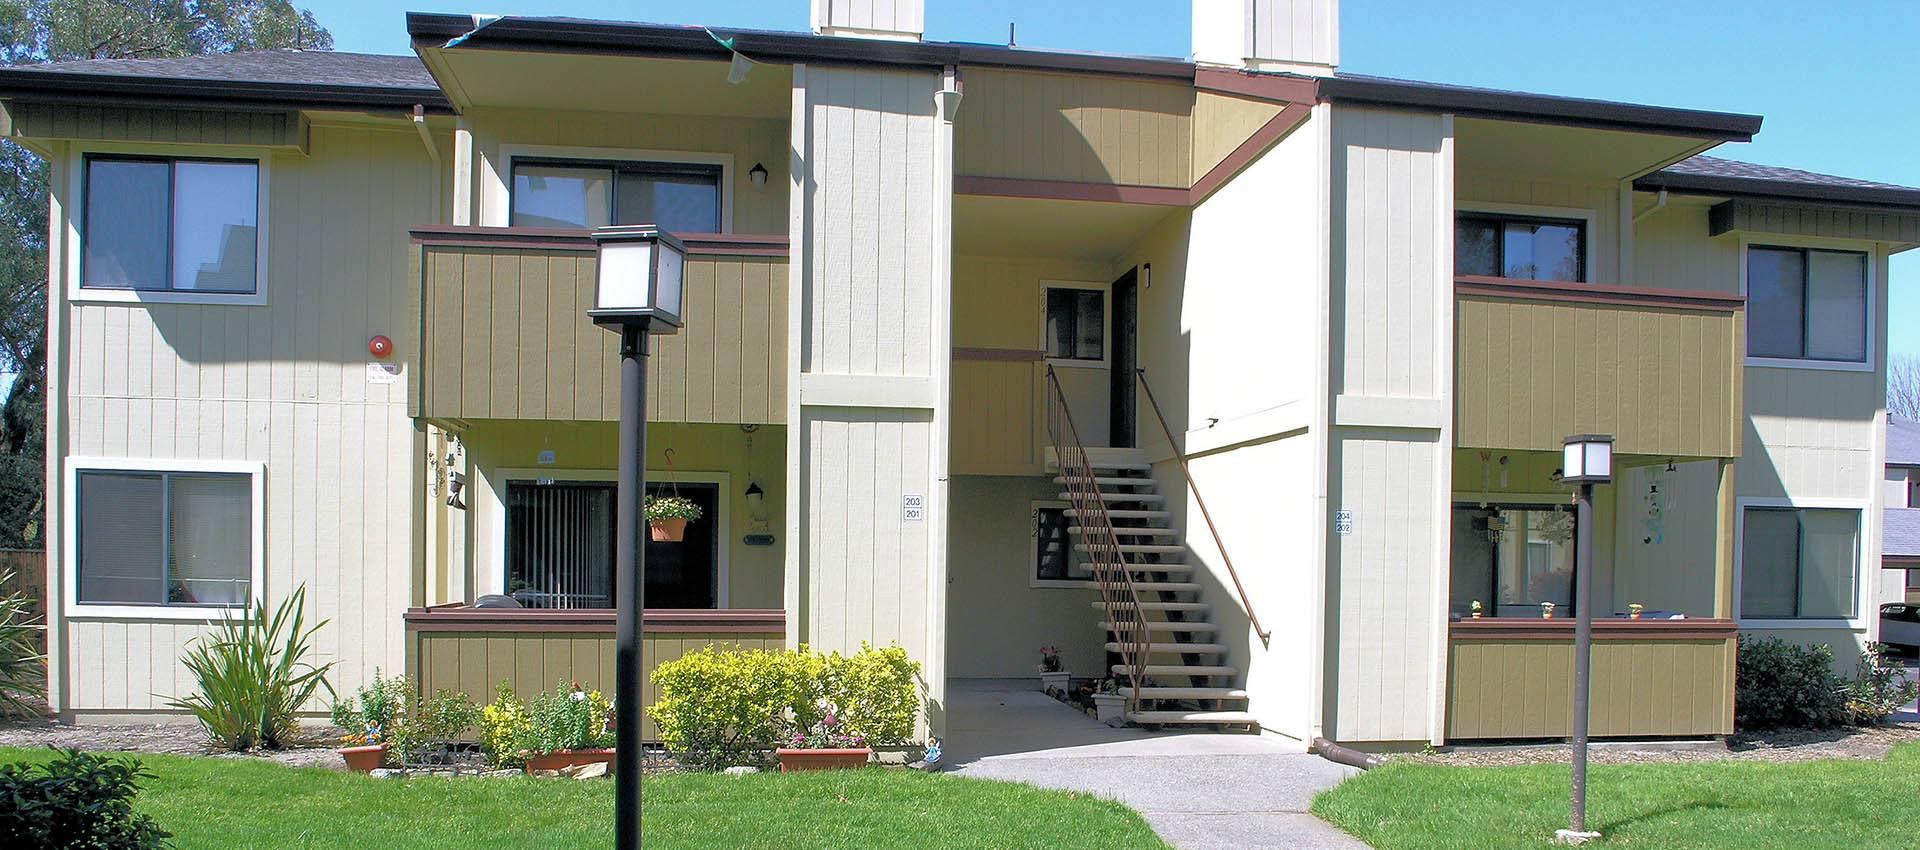 Park Ridge Apartment Homes Rohnert Park Ca